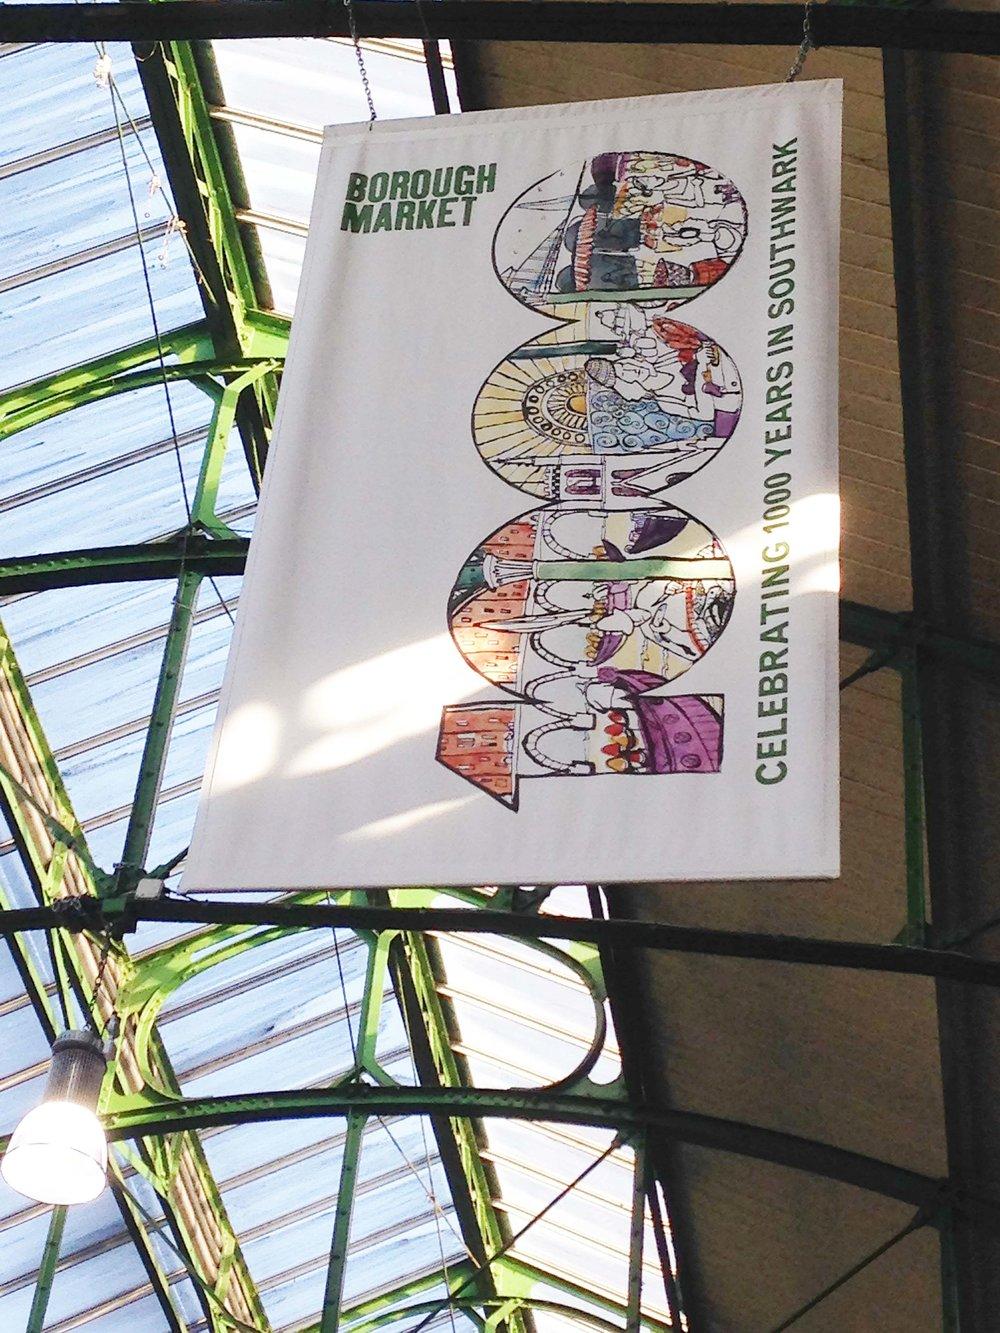 1000-logo-vertical-banner-at-Borough-Market.jpg